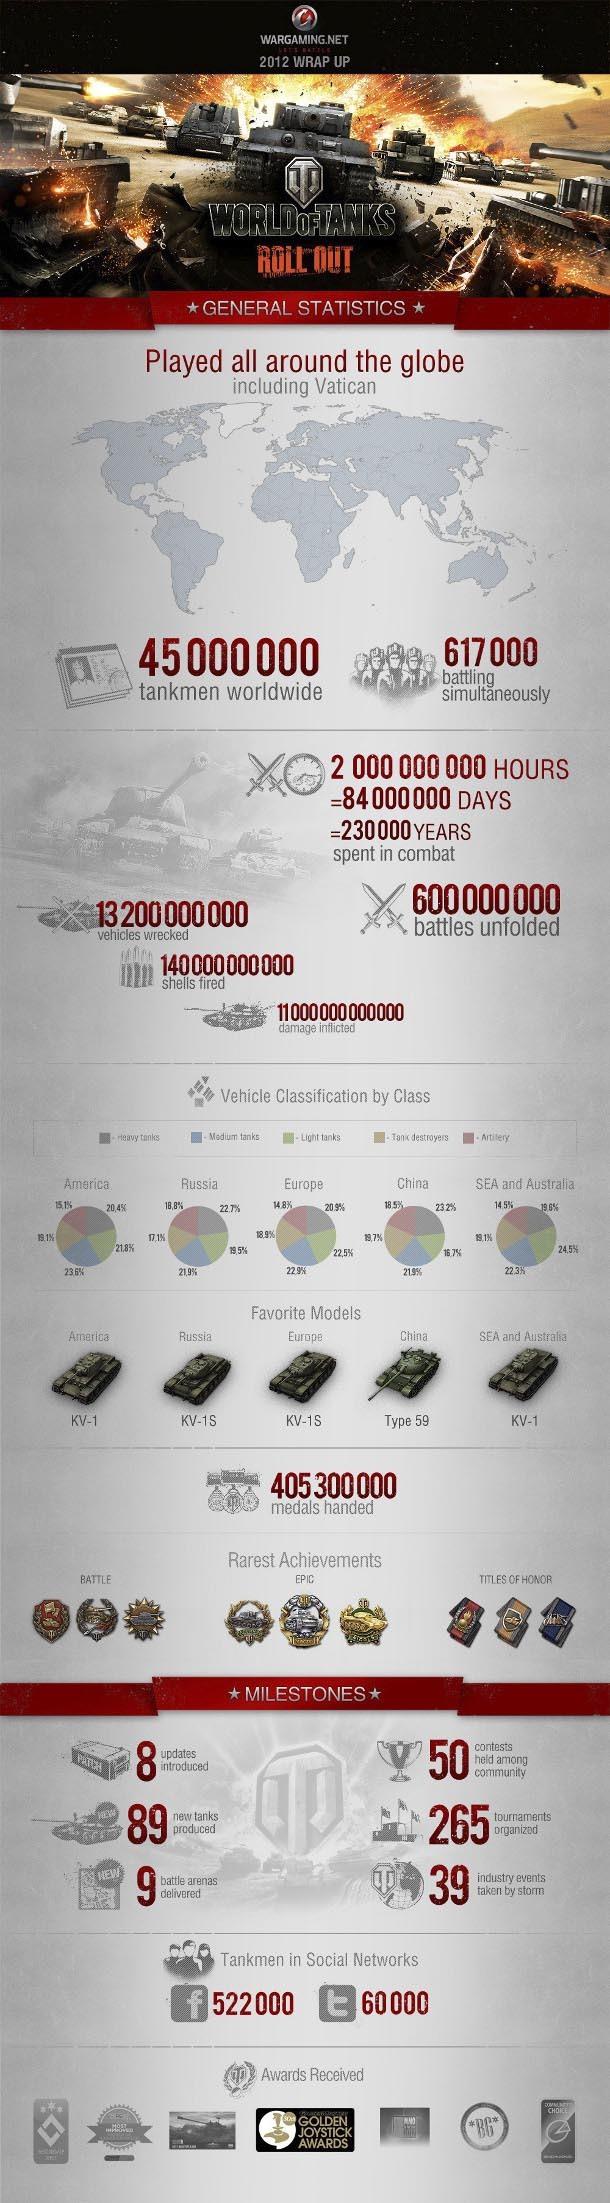 Foto de World of Tanks (1/1)